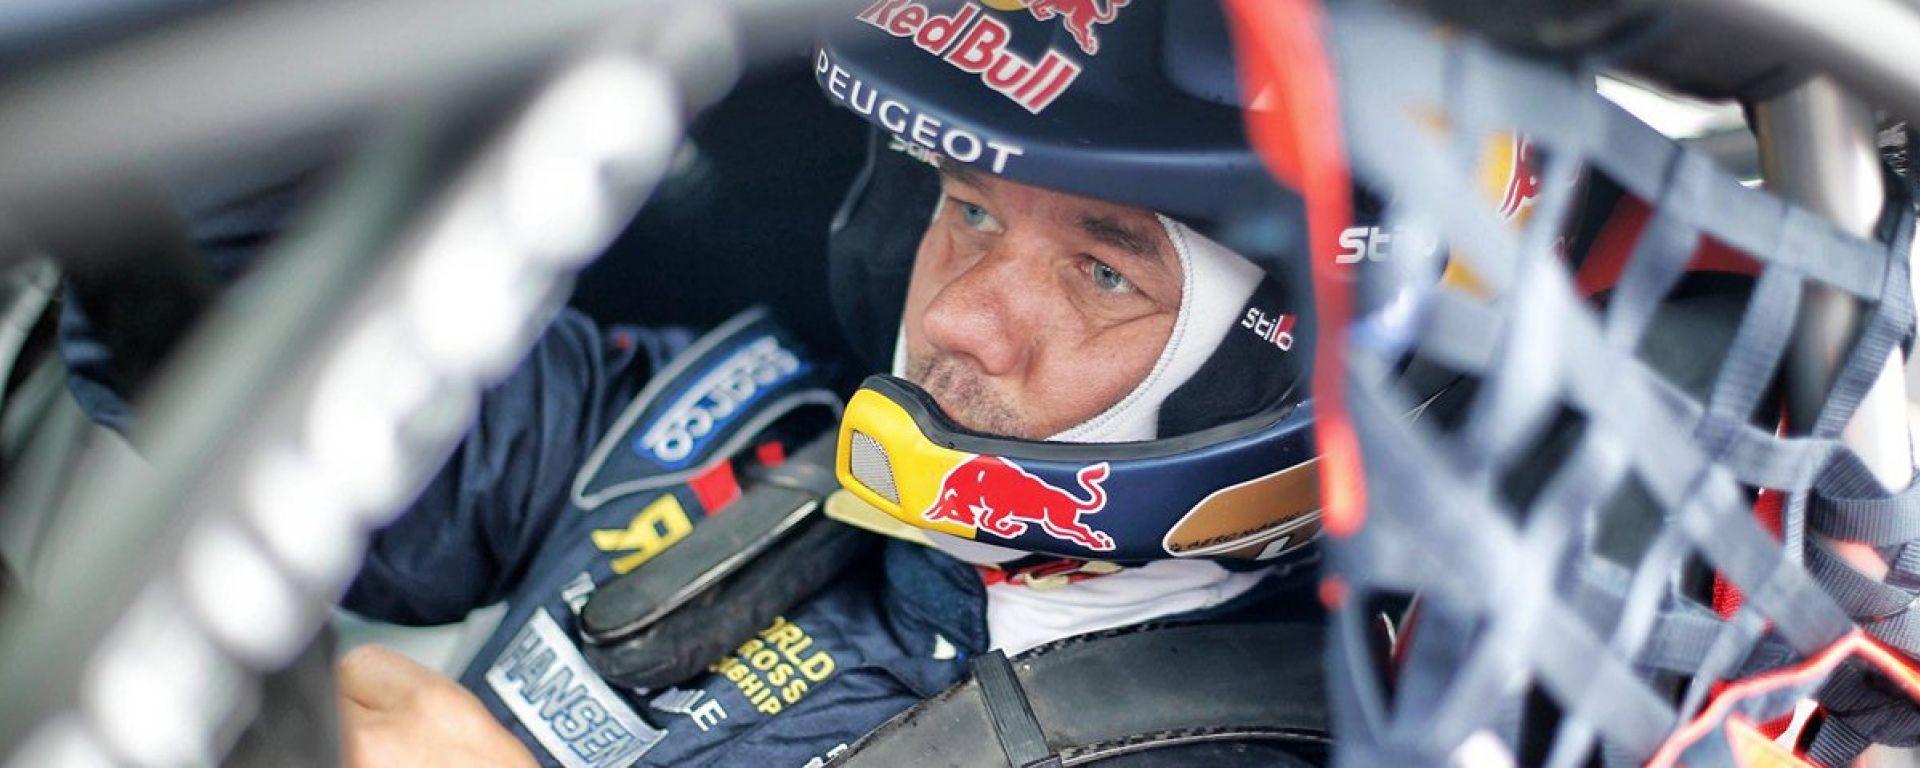 Peugeot 208 WRX - Team Hansen - Sebastien Loeb